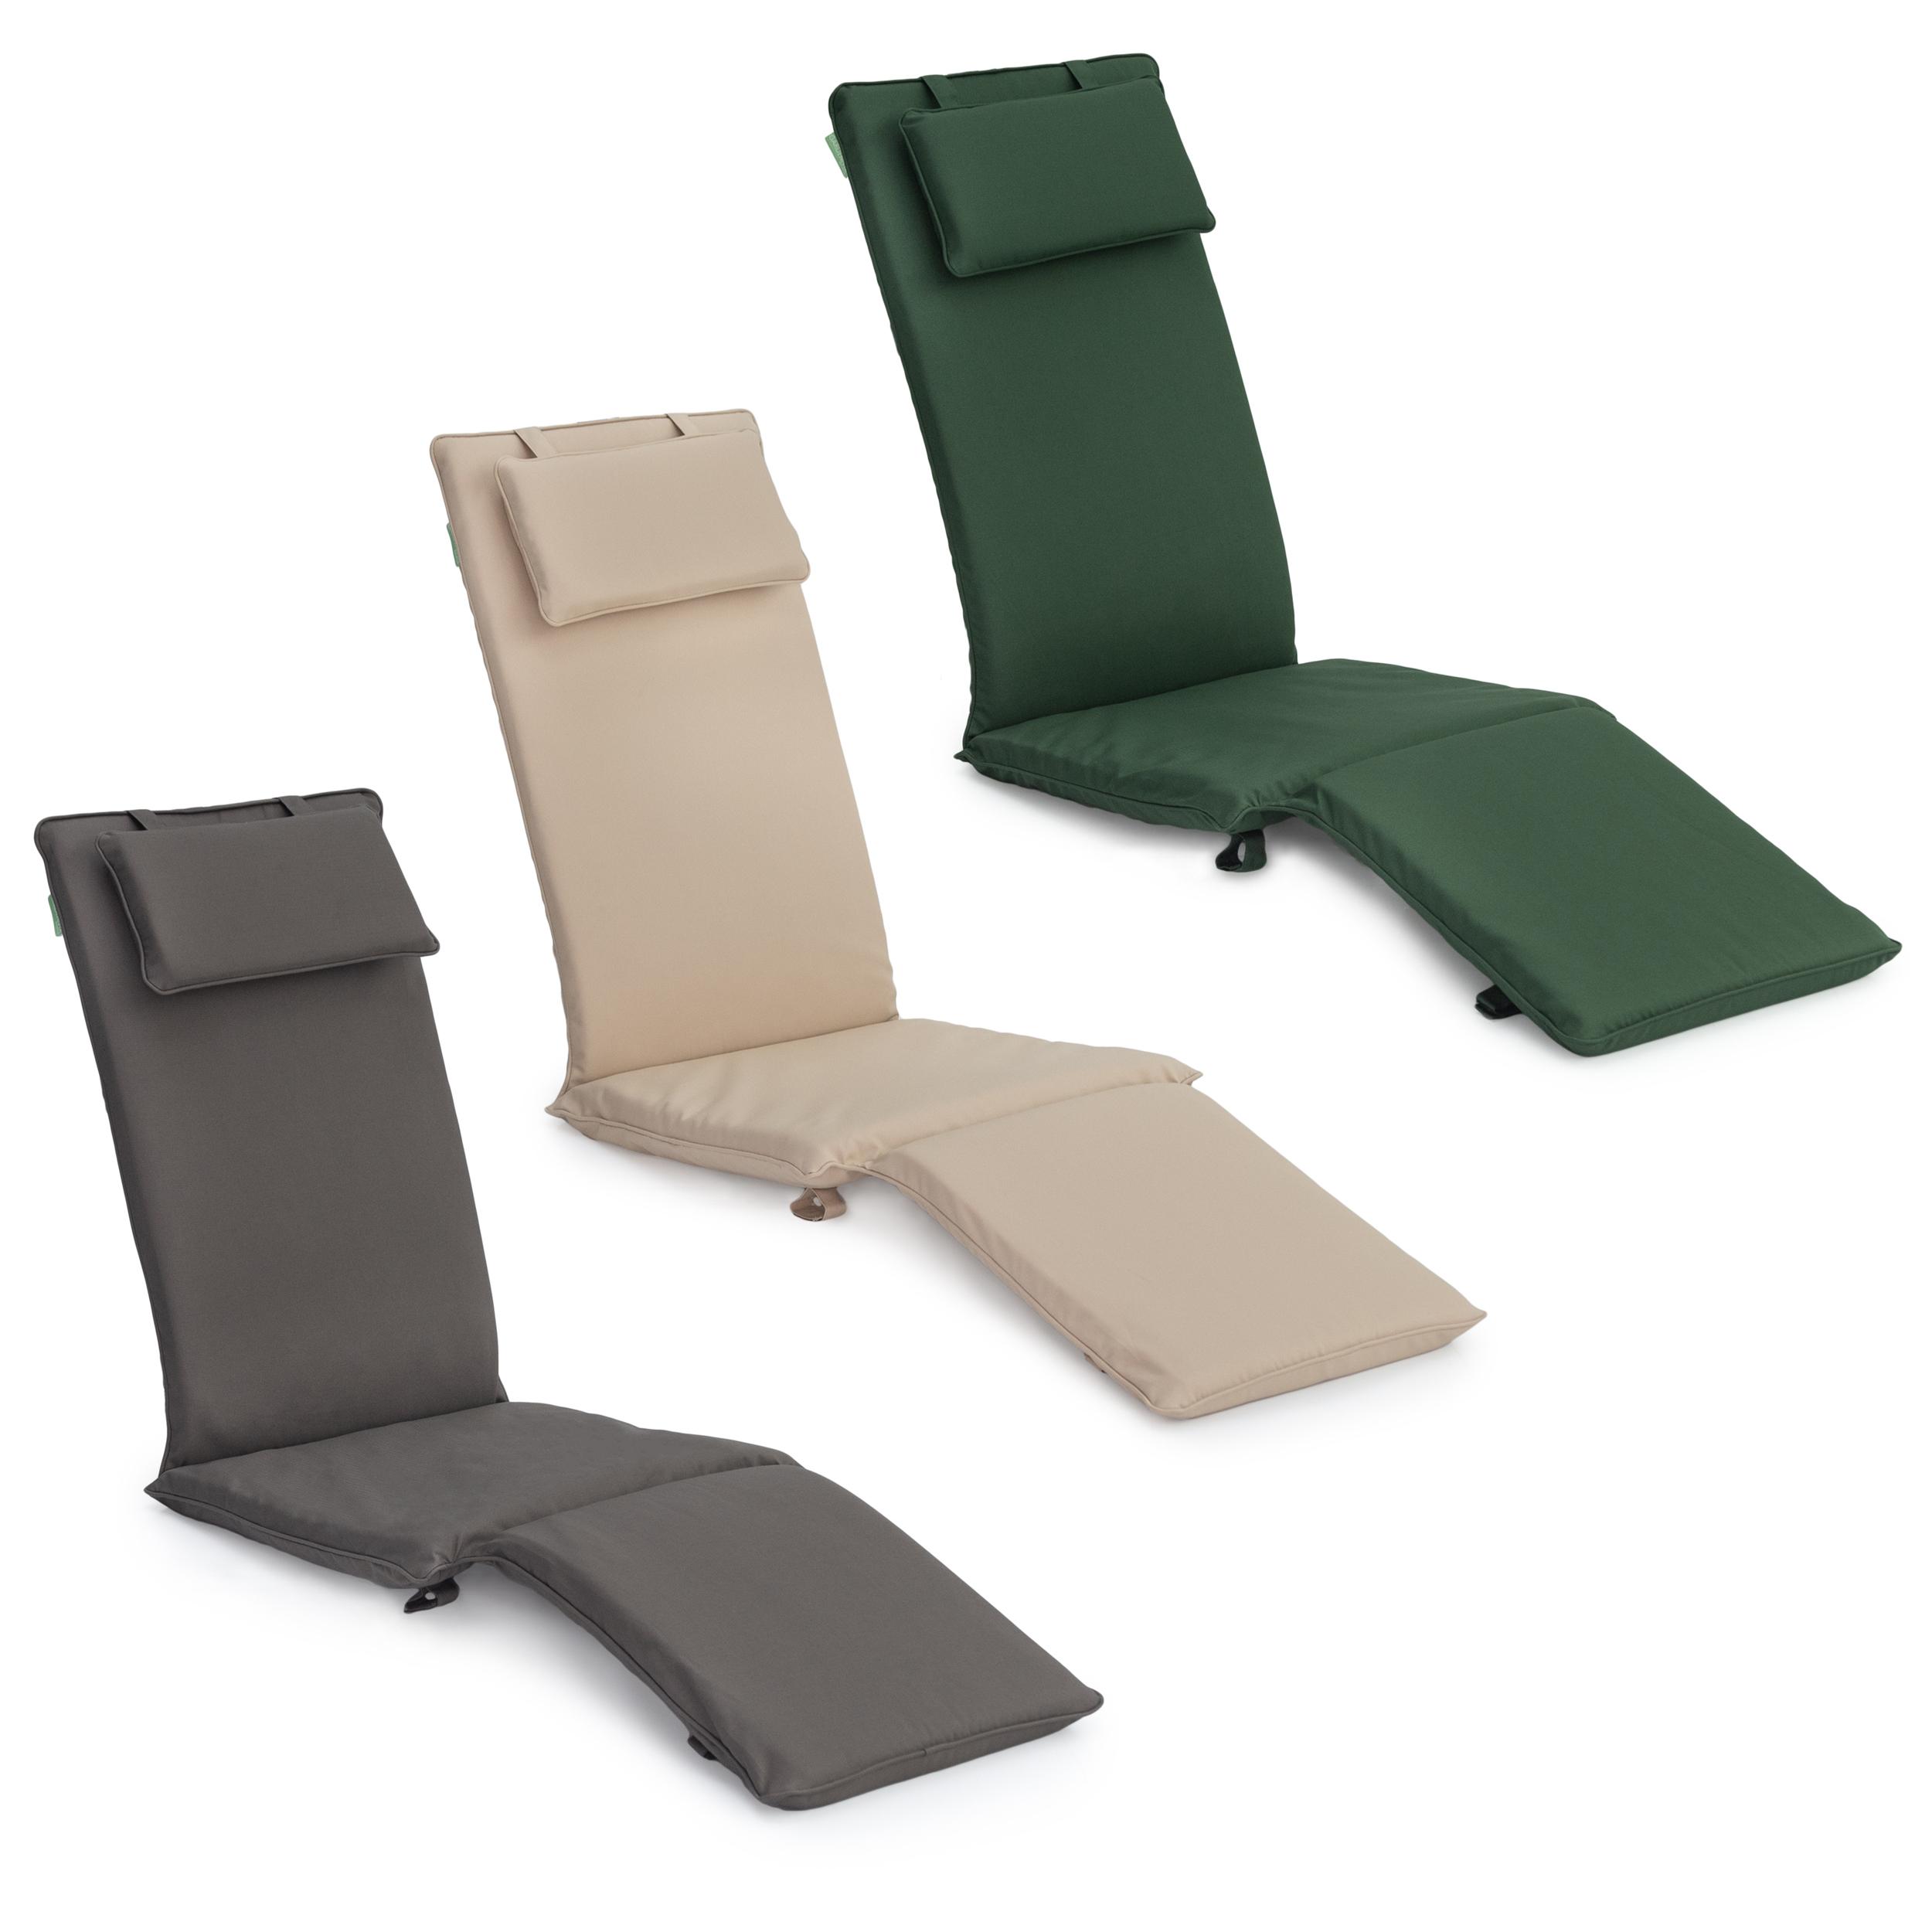 Garden Deck Steamer Chair Cushion Seat